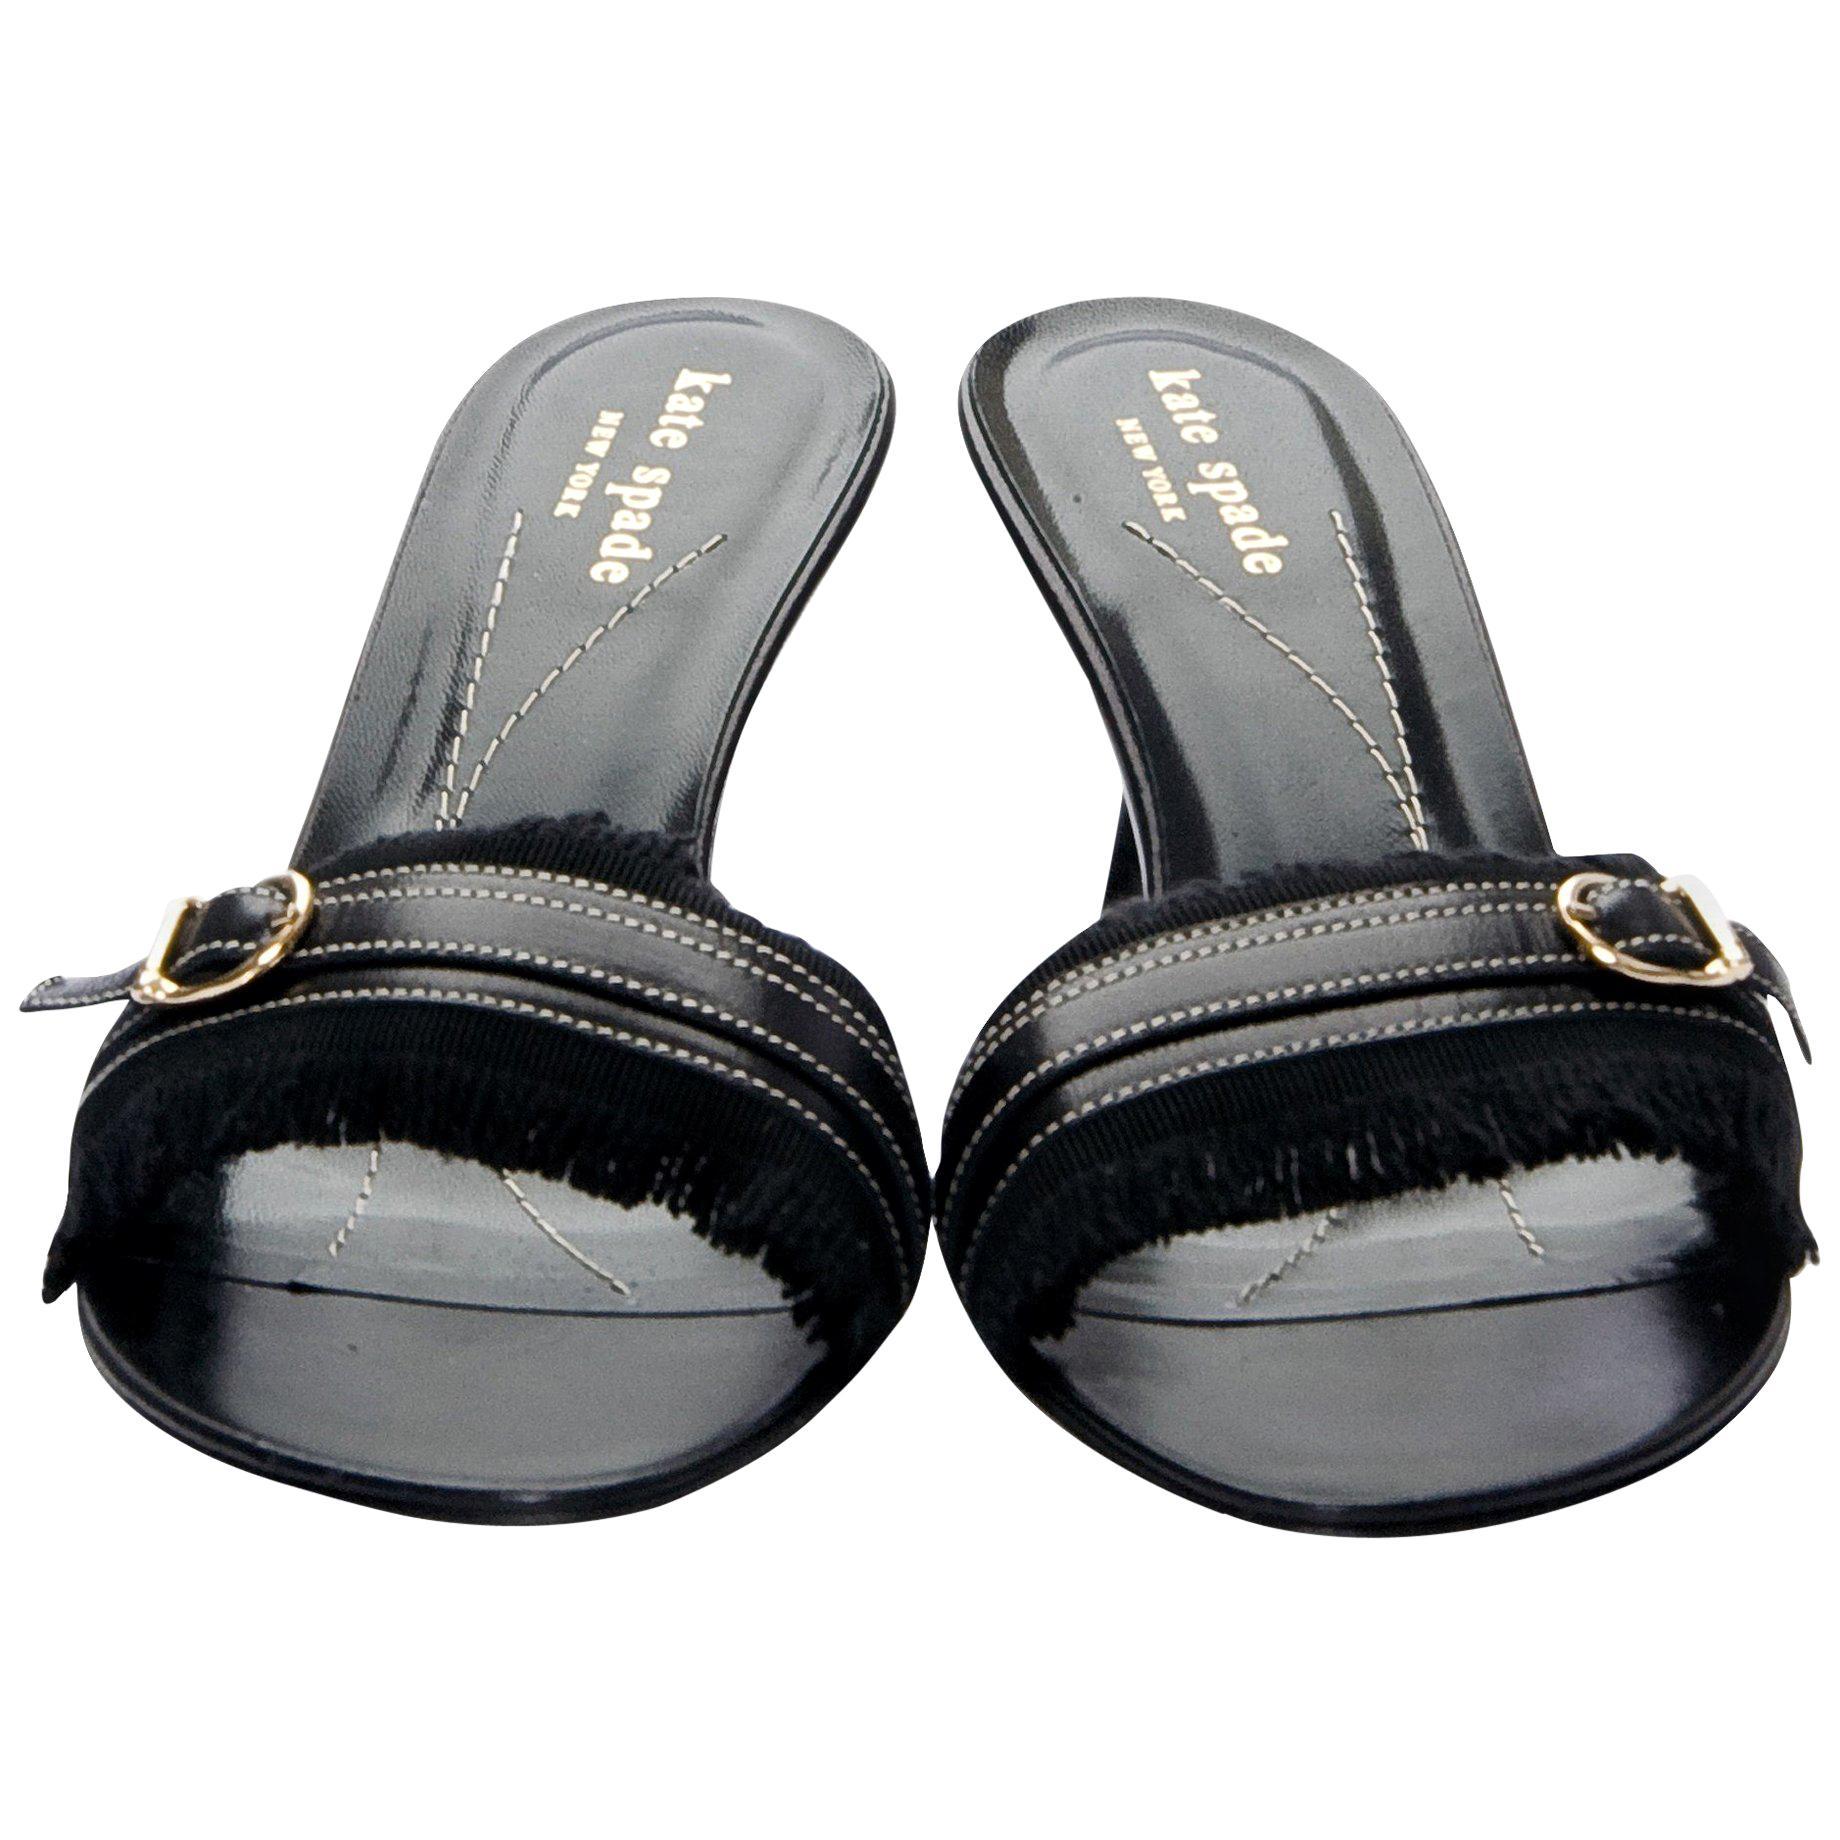 fa940cf2cab Vintage and Designer Shoes - 2